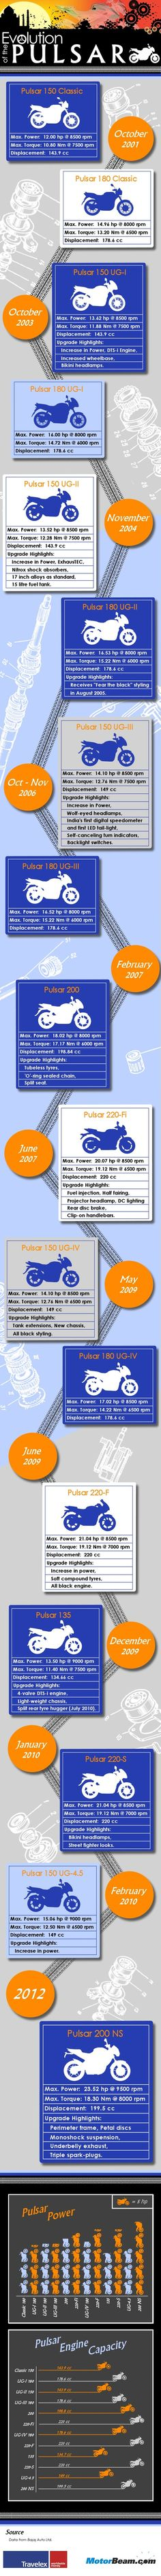 How The Bajaj Pulsar Has Evolved - Infographic   MotorBeam - Indian Car Bike News